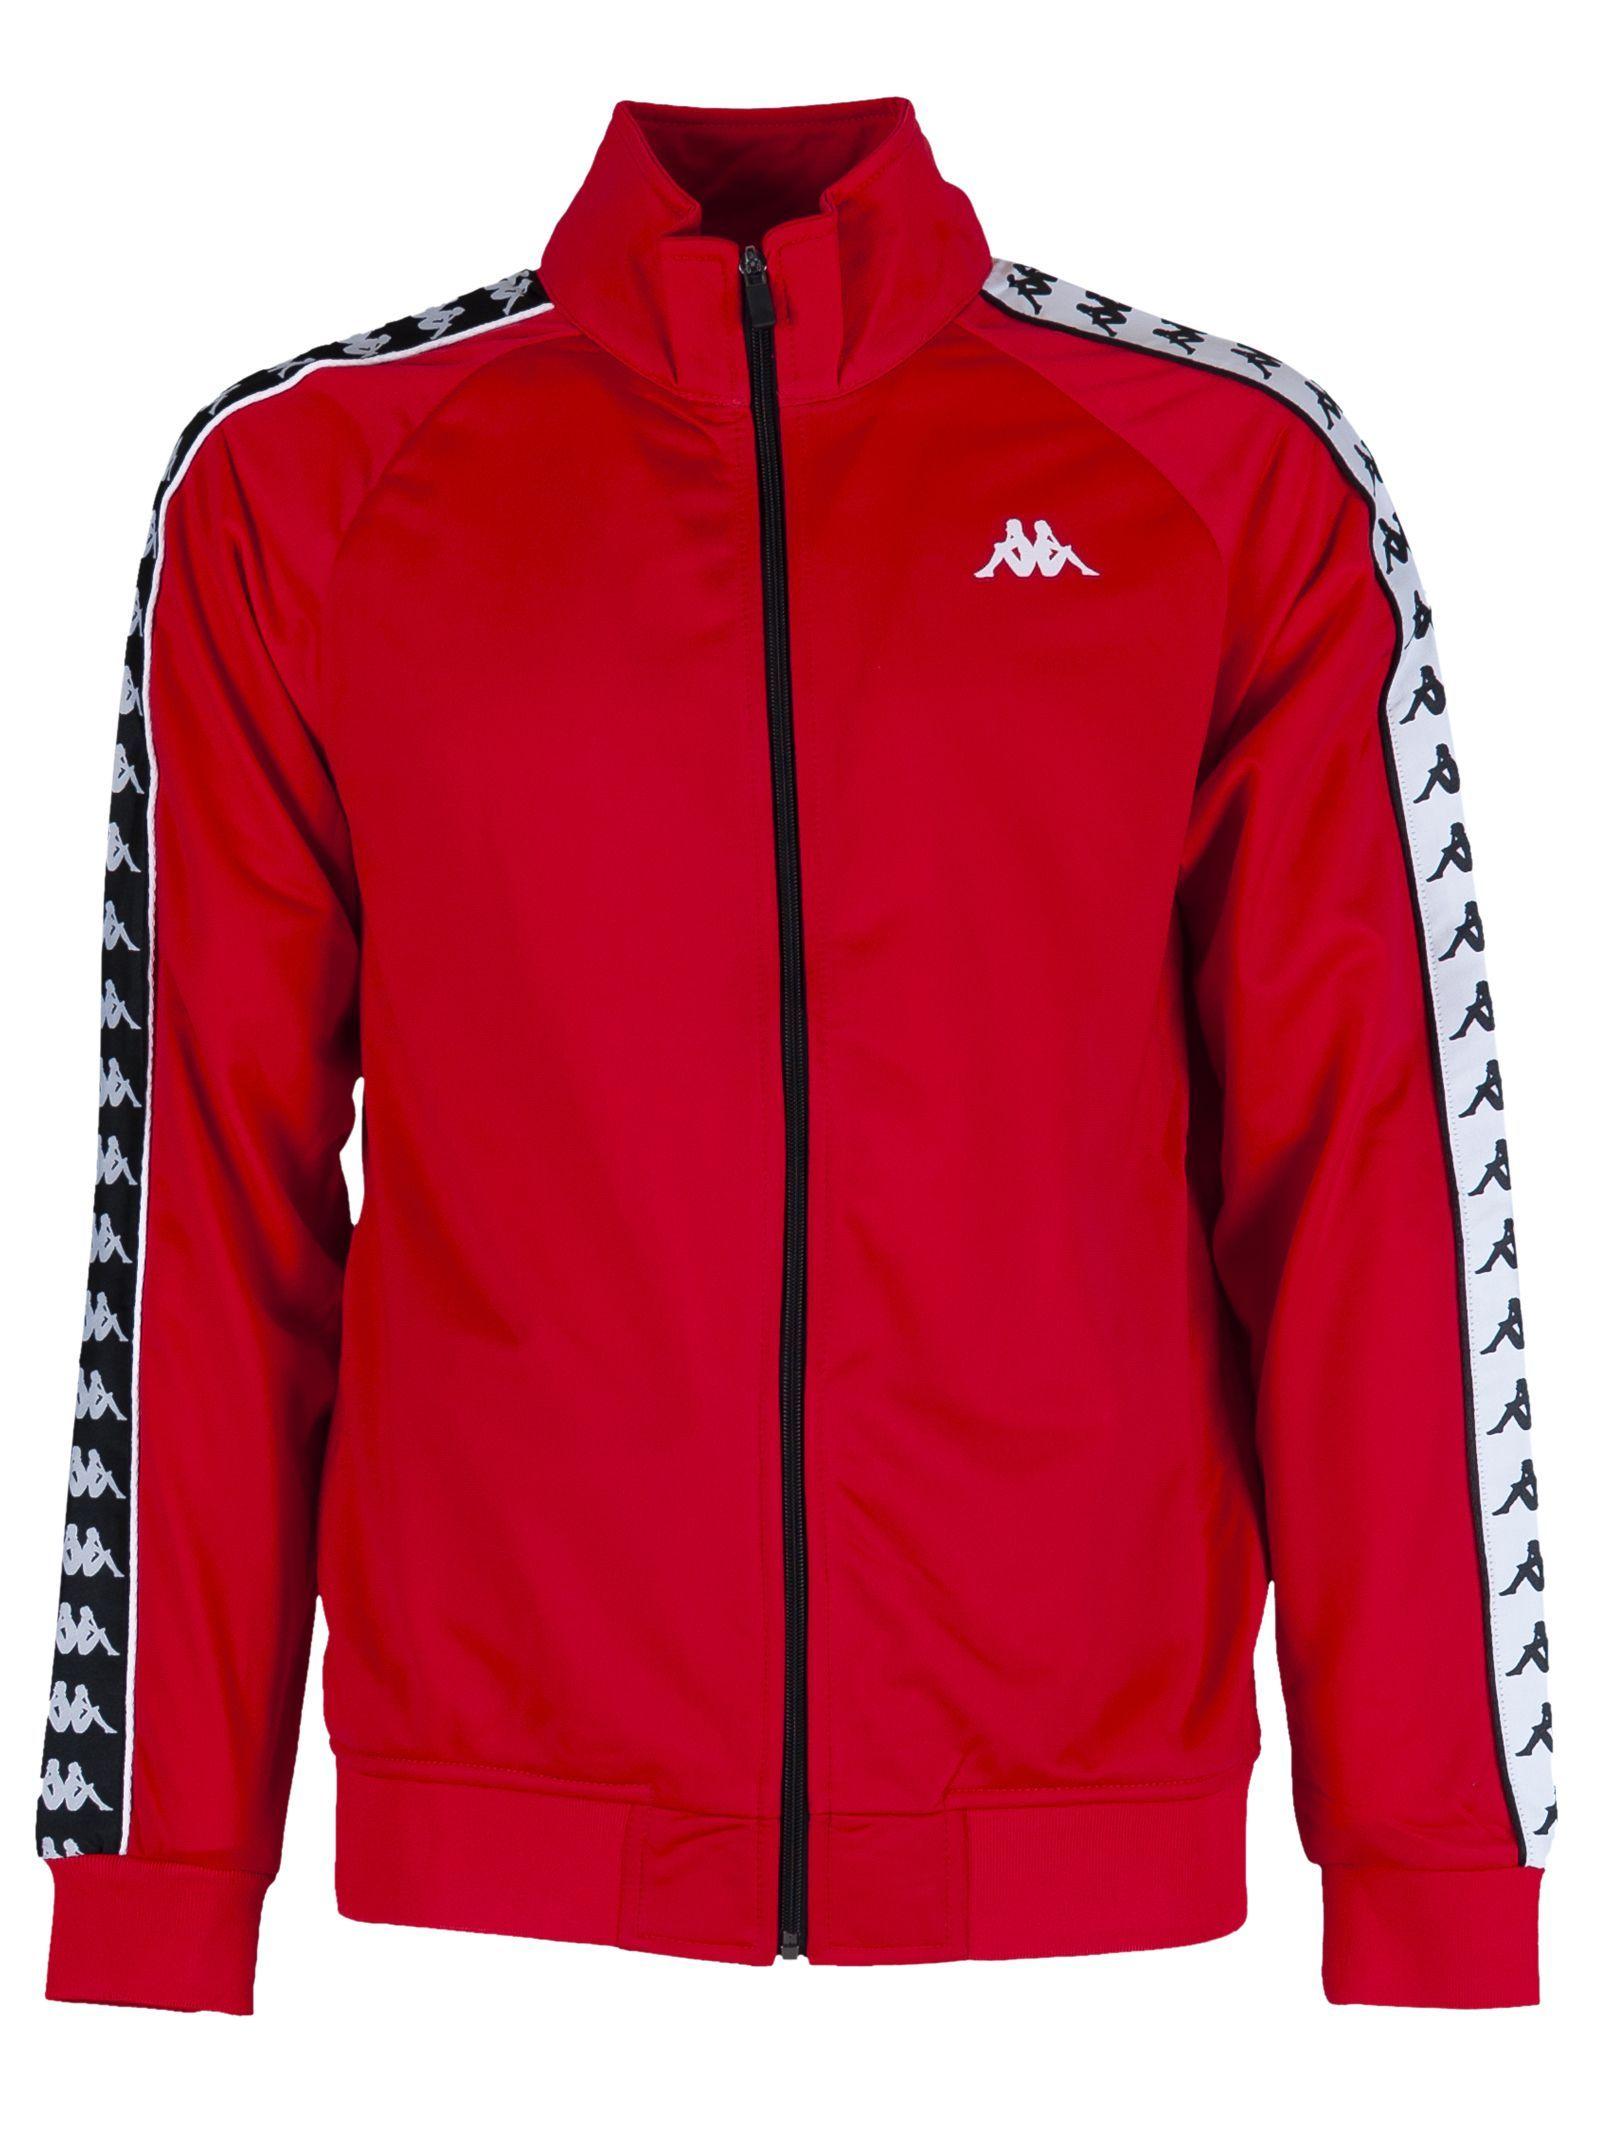 Kappa 222 Banda Anniston Slim Kappa Cloth Kappa Clothing Sporty Outfits Men Kappa Sportswear [ 2136 x 1600 Pixel ]